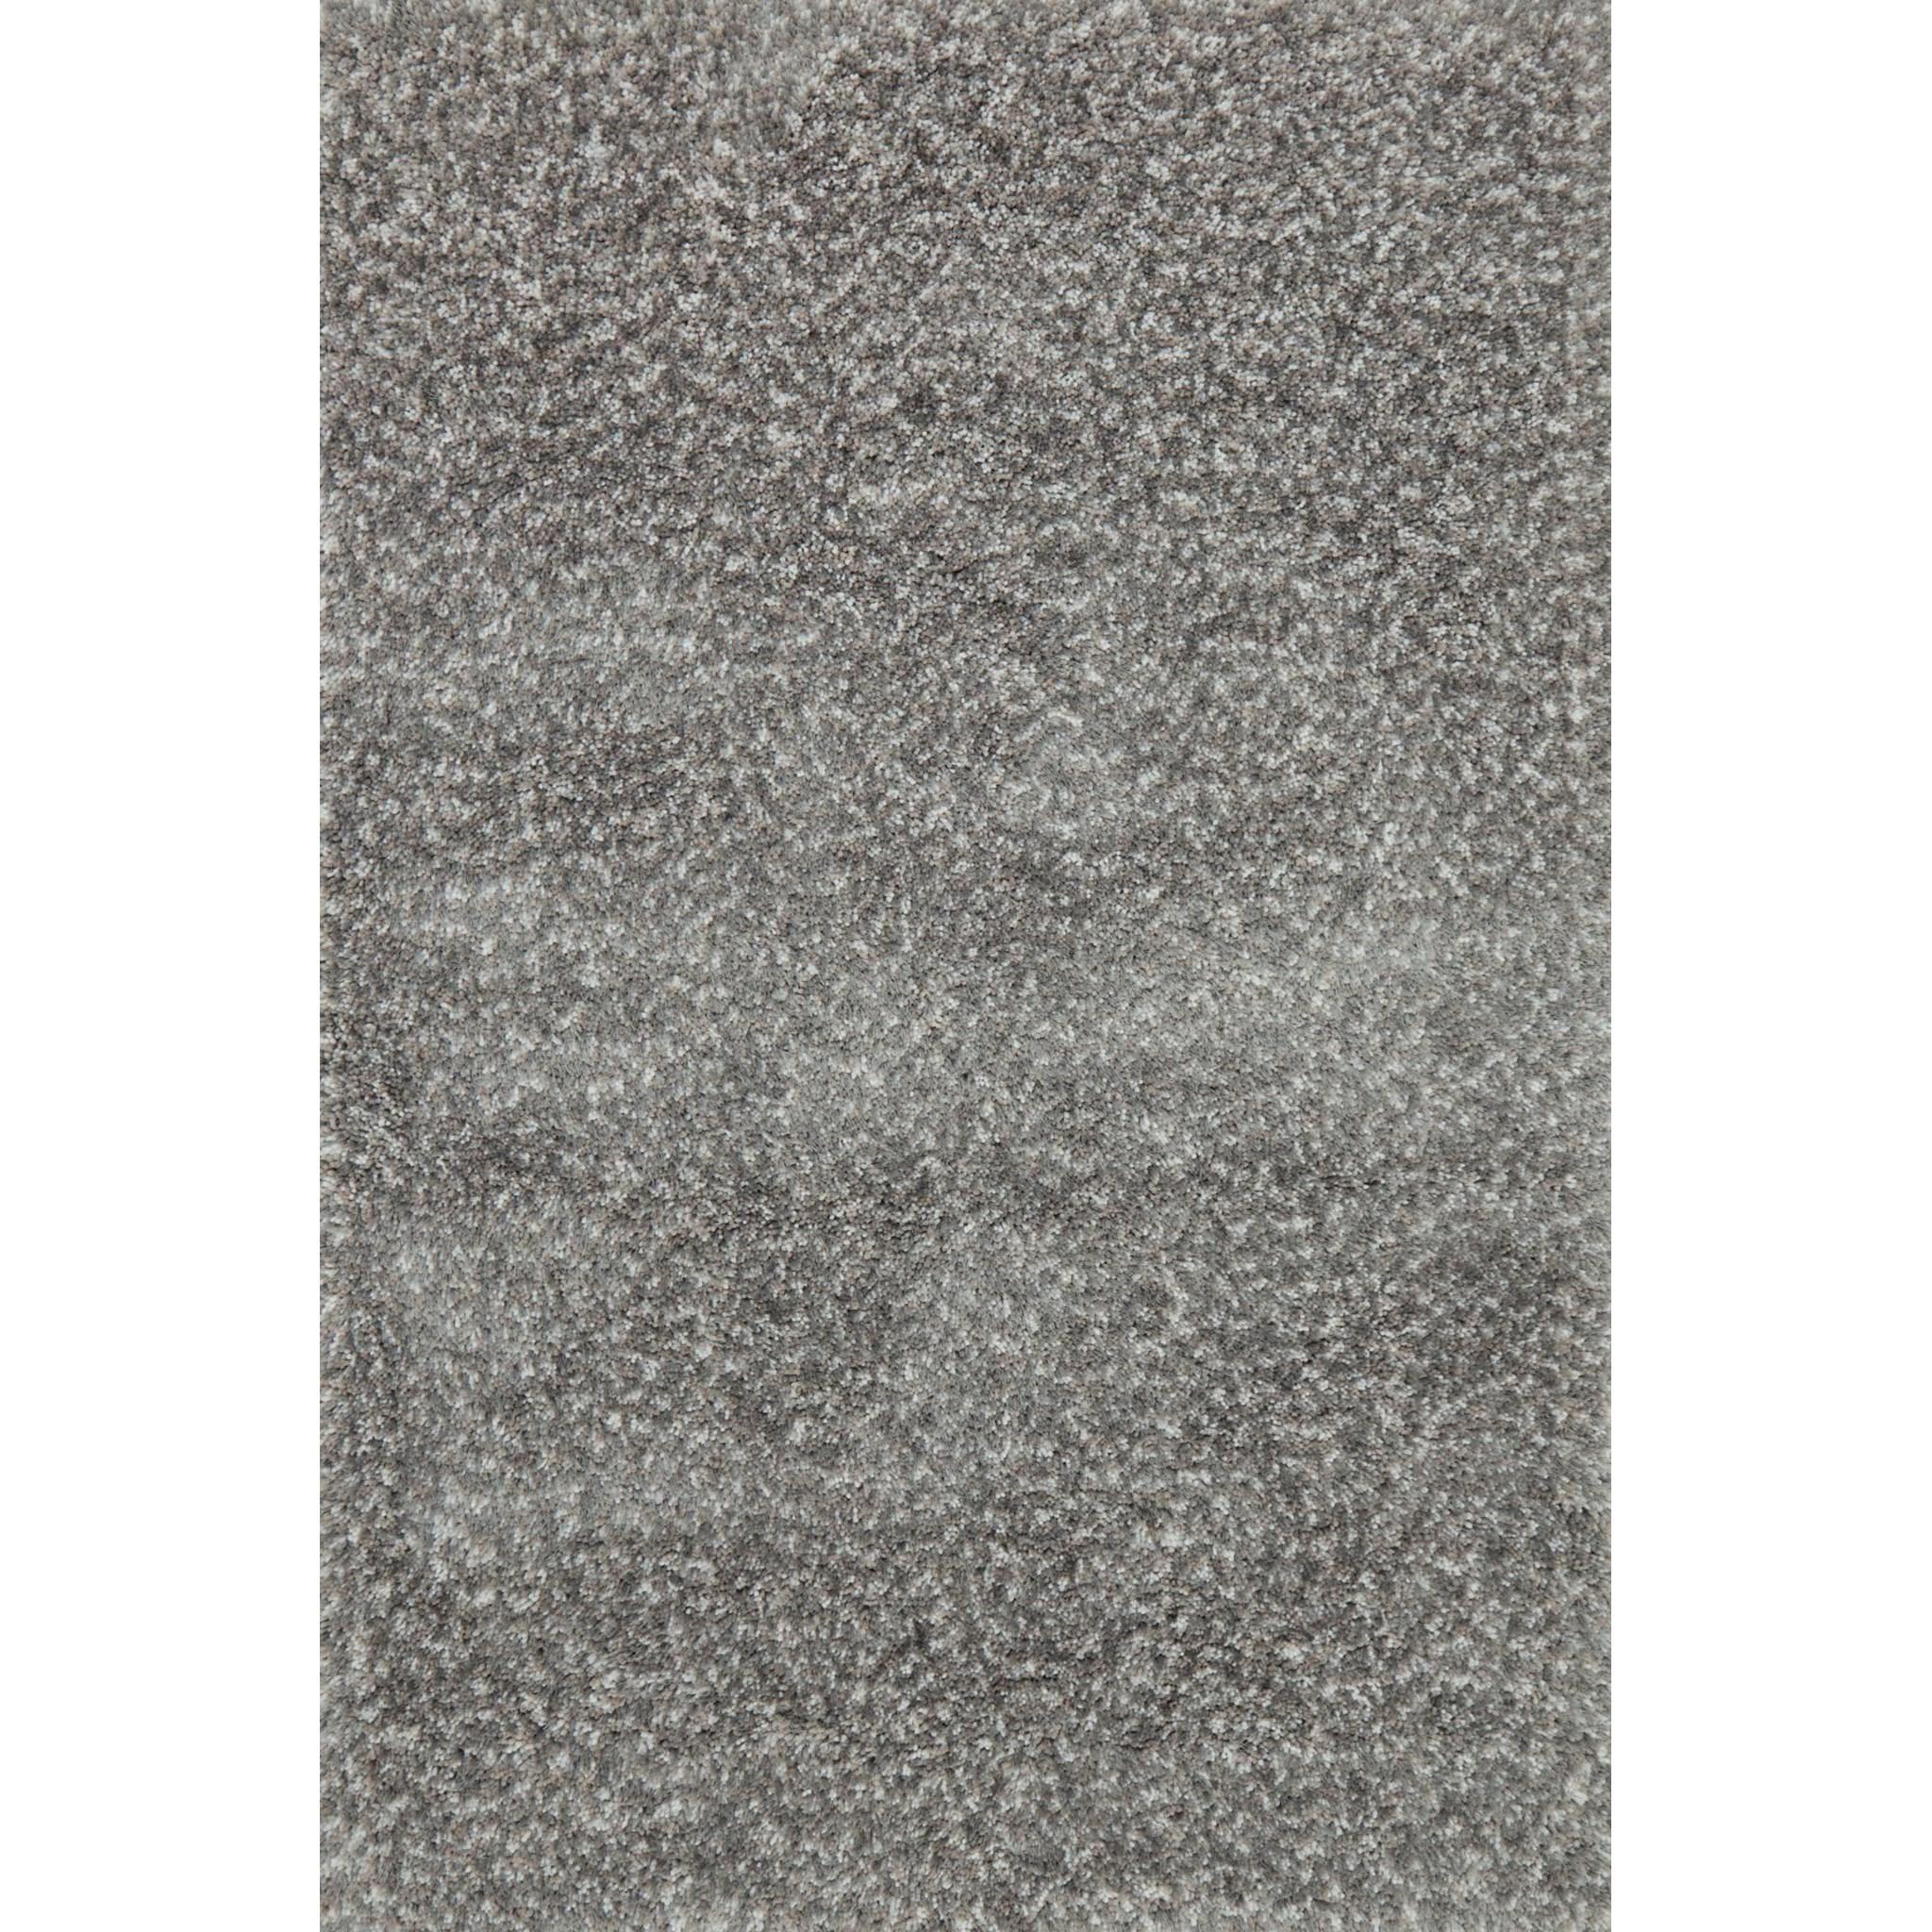 "Callie Shag 7'-10"" X 7'-10"" Round Rug by Loloi Rugs at Virginia Furniture Market"